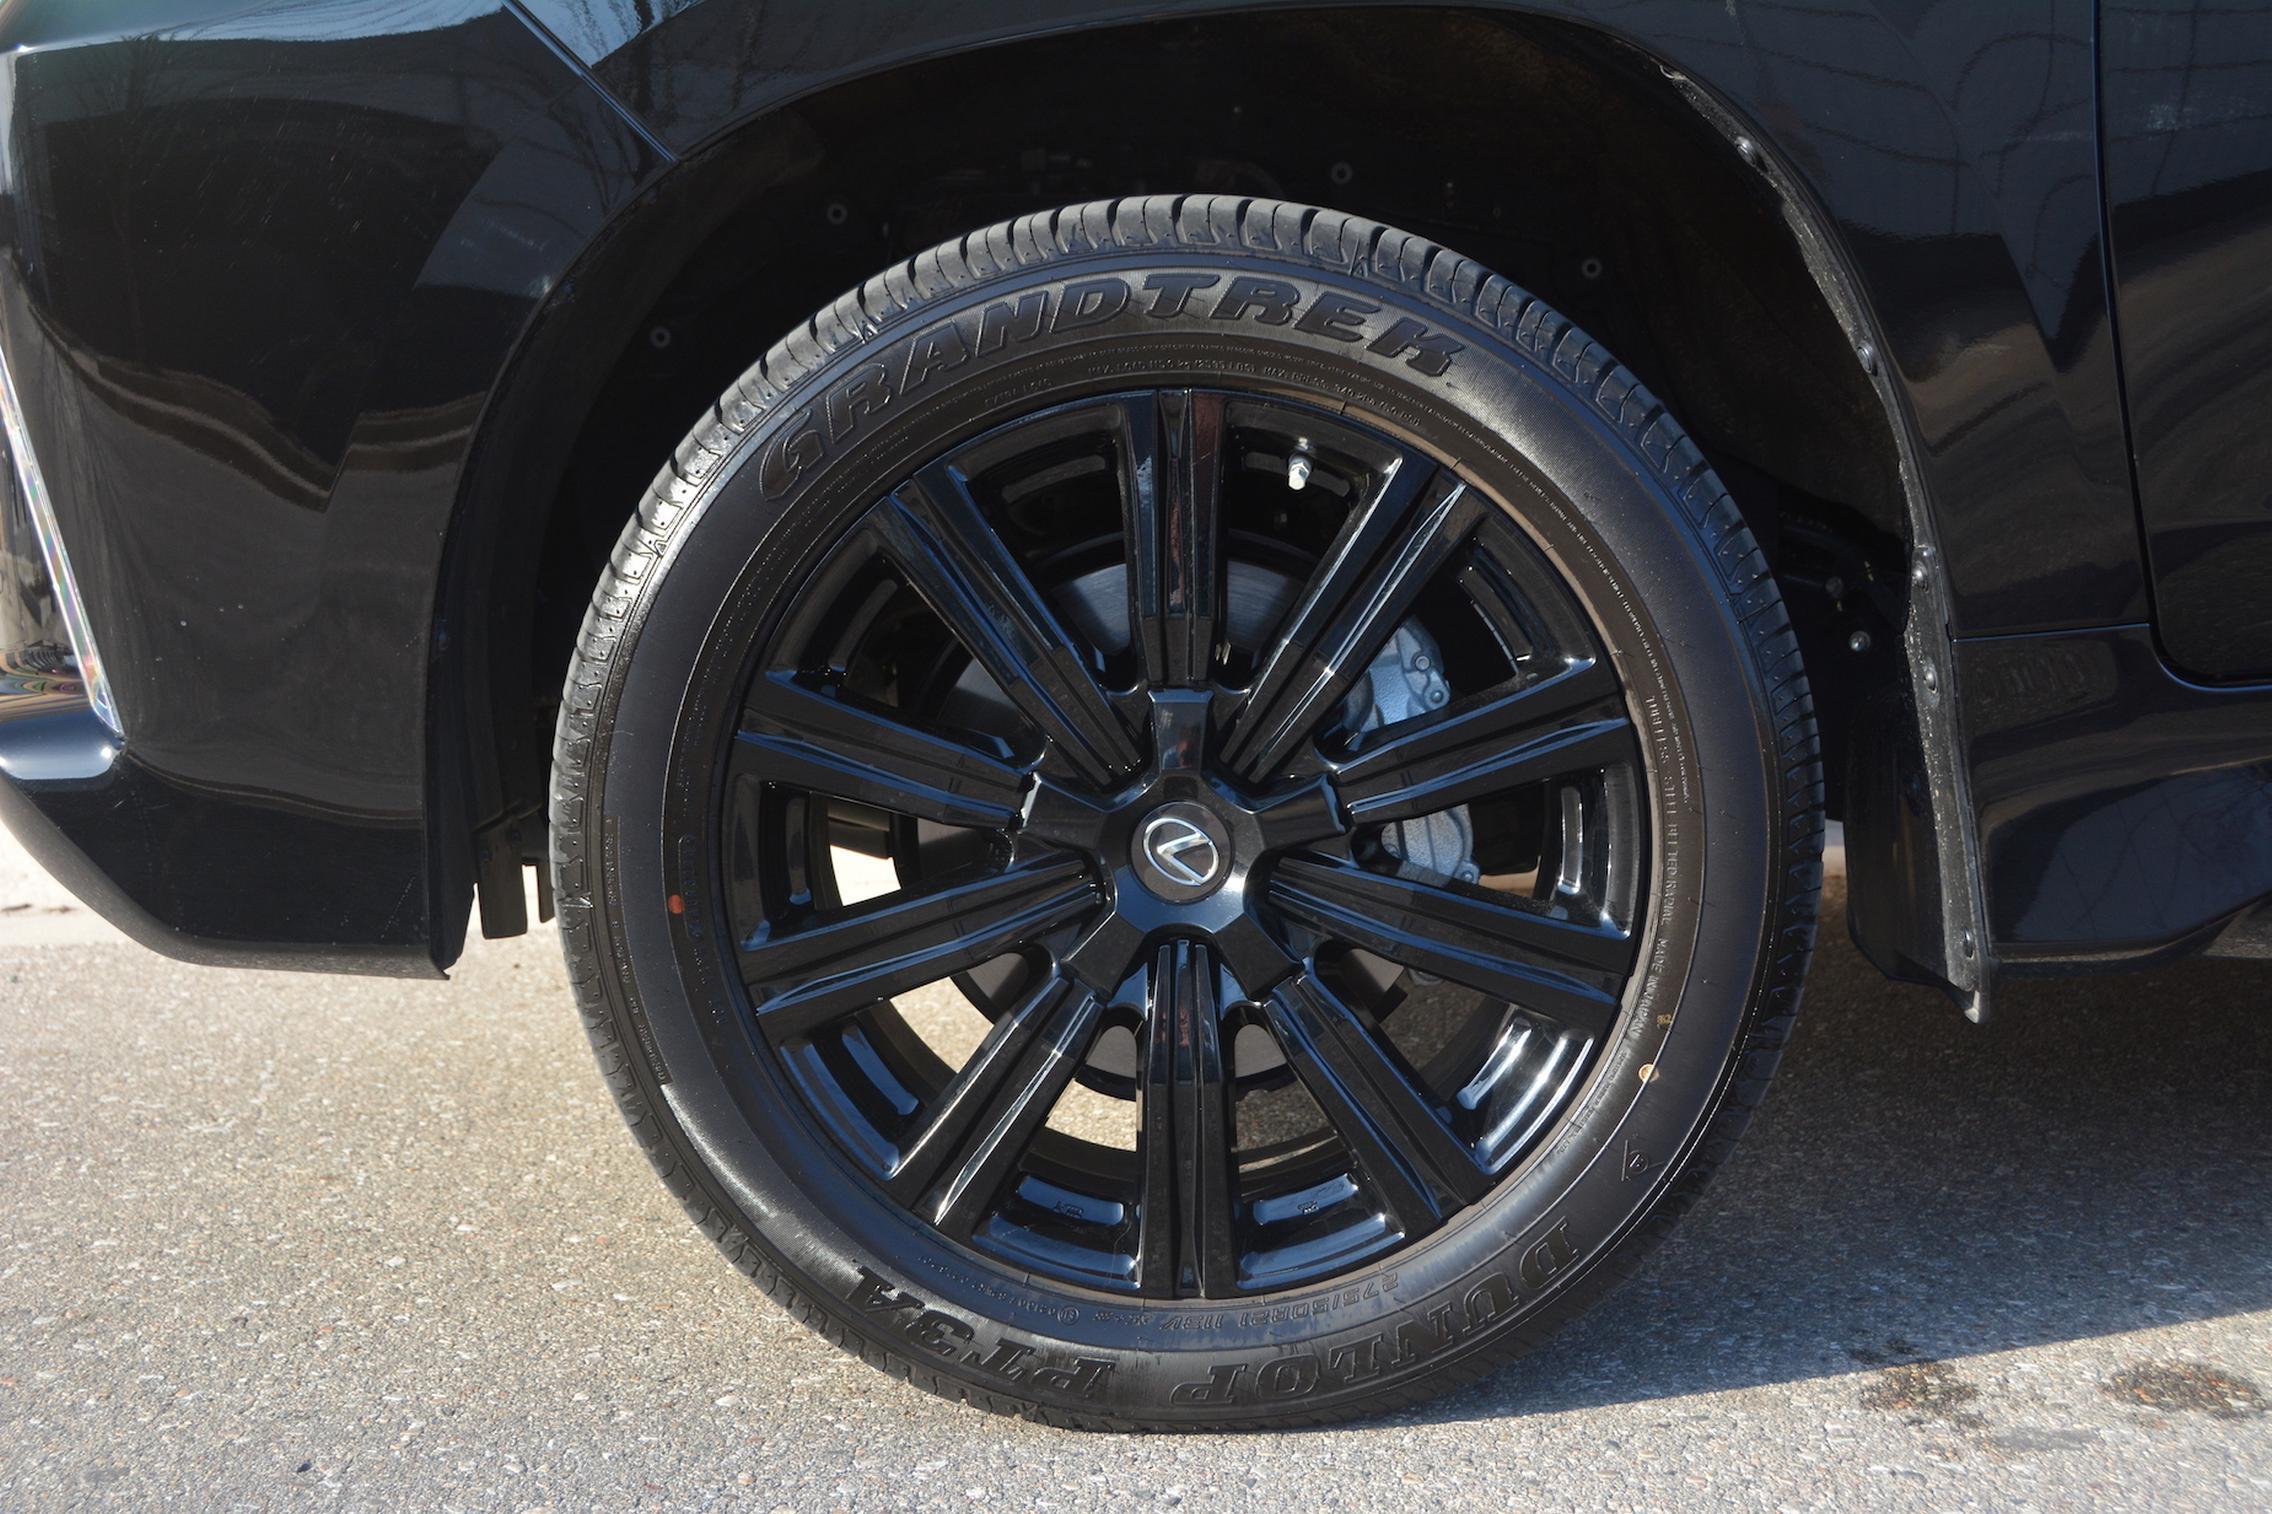 2021 Lexus LX570 wheels